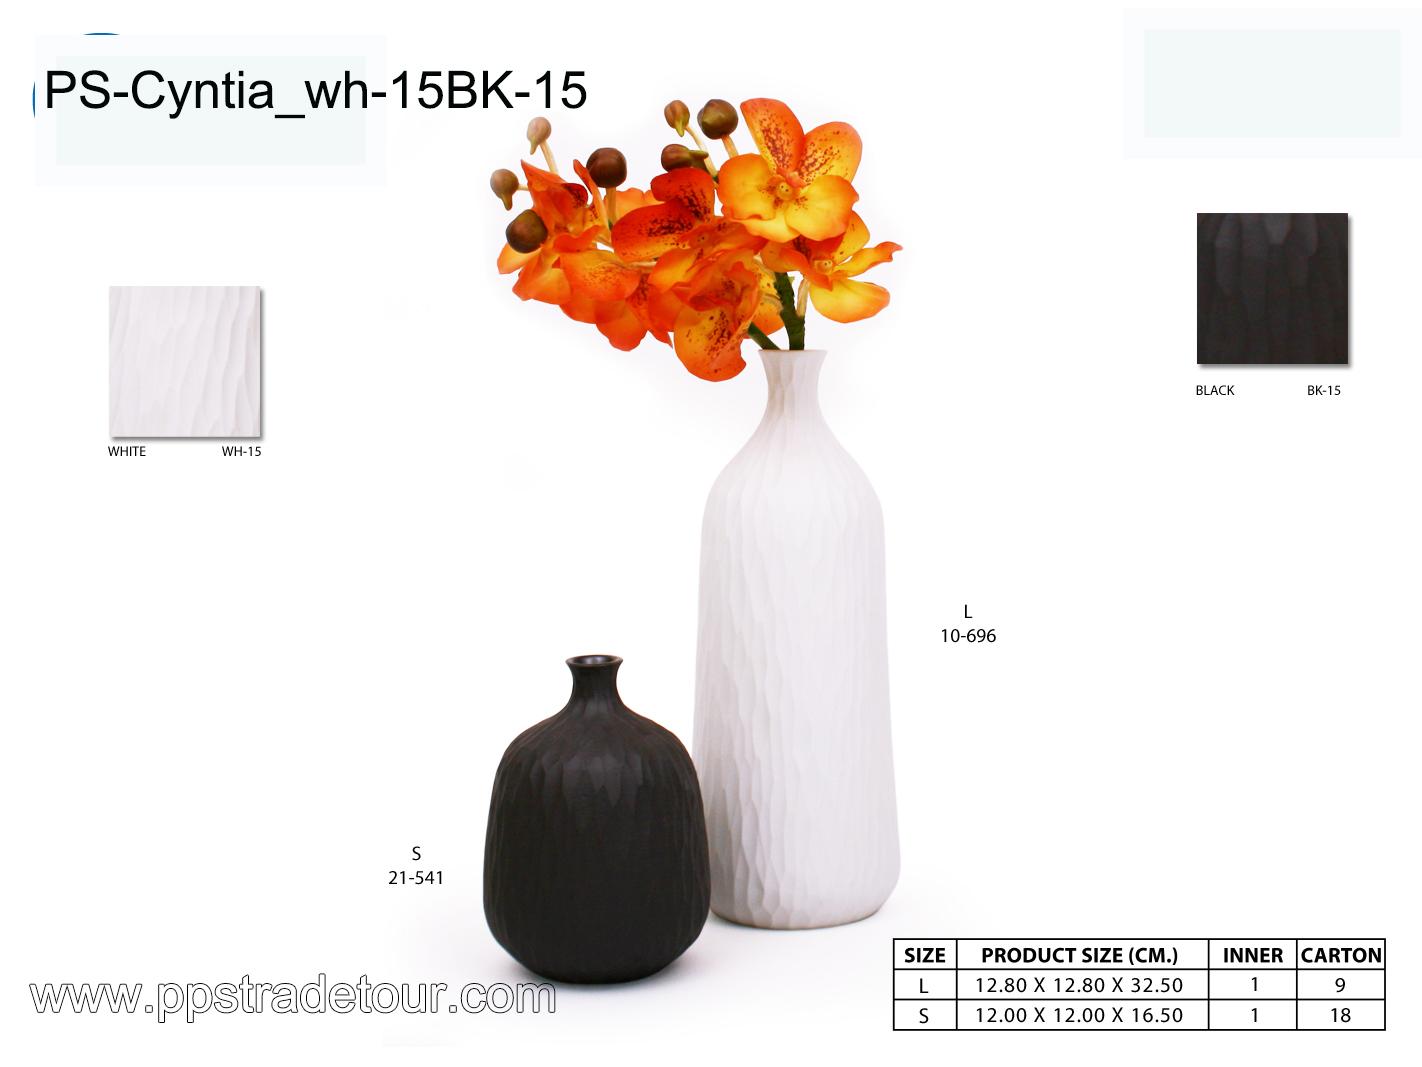 PSCV-Cyntia_wh-15BK-15